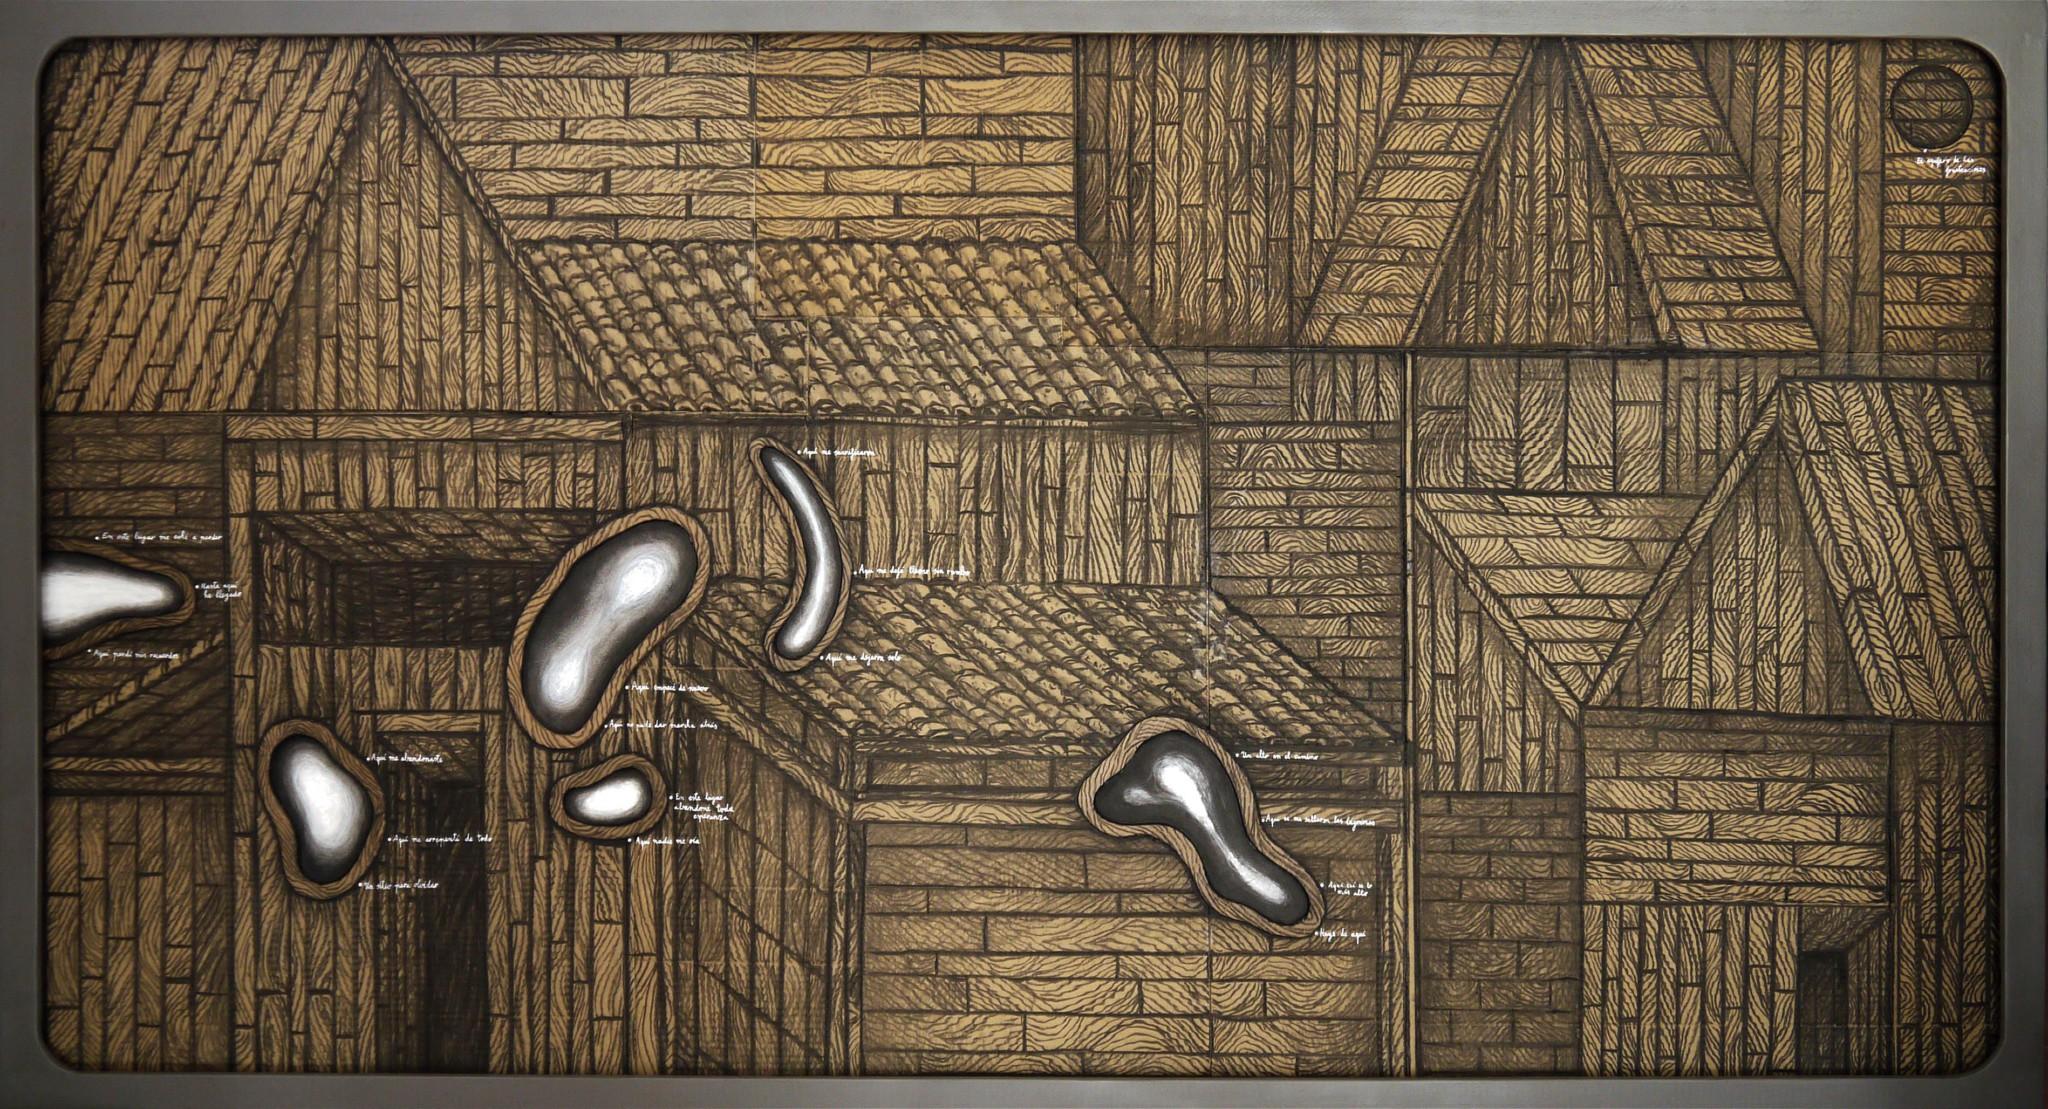 Archipiélago frustración (2019) - Manuel Barbero Richart